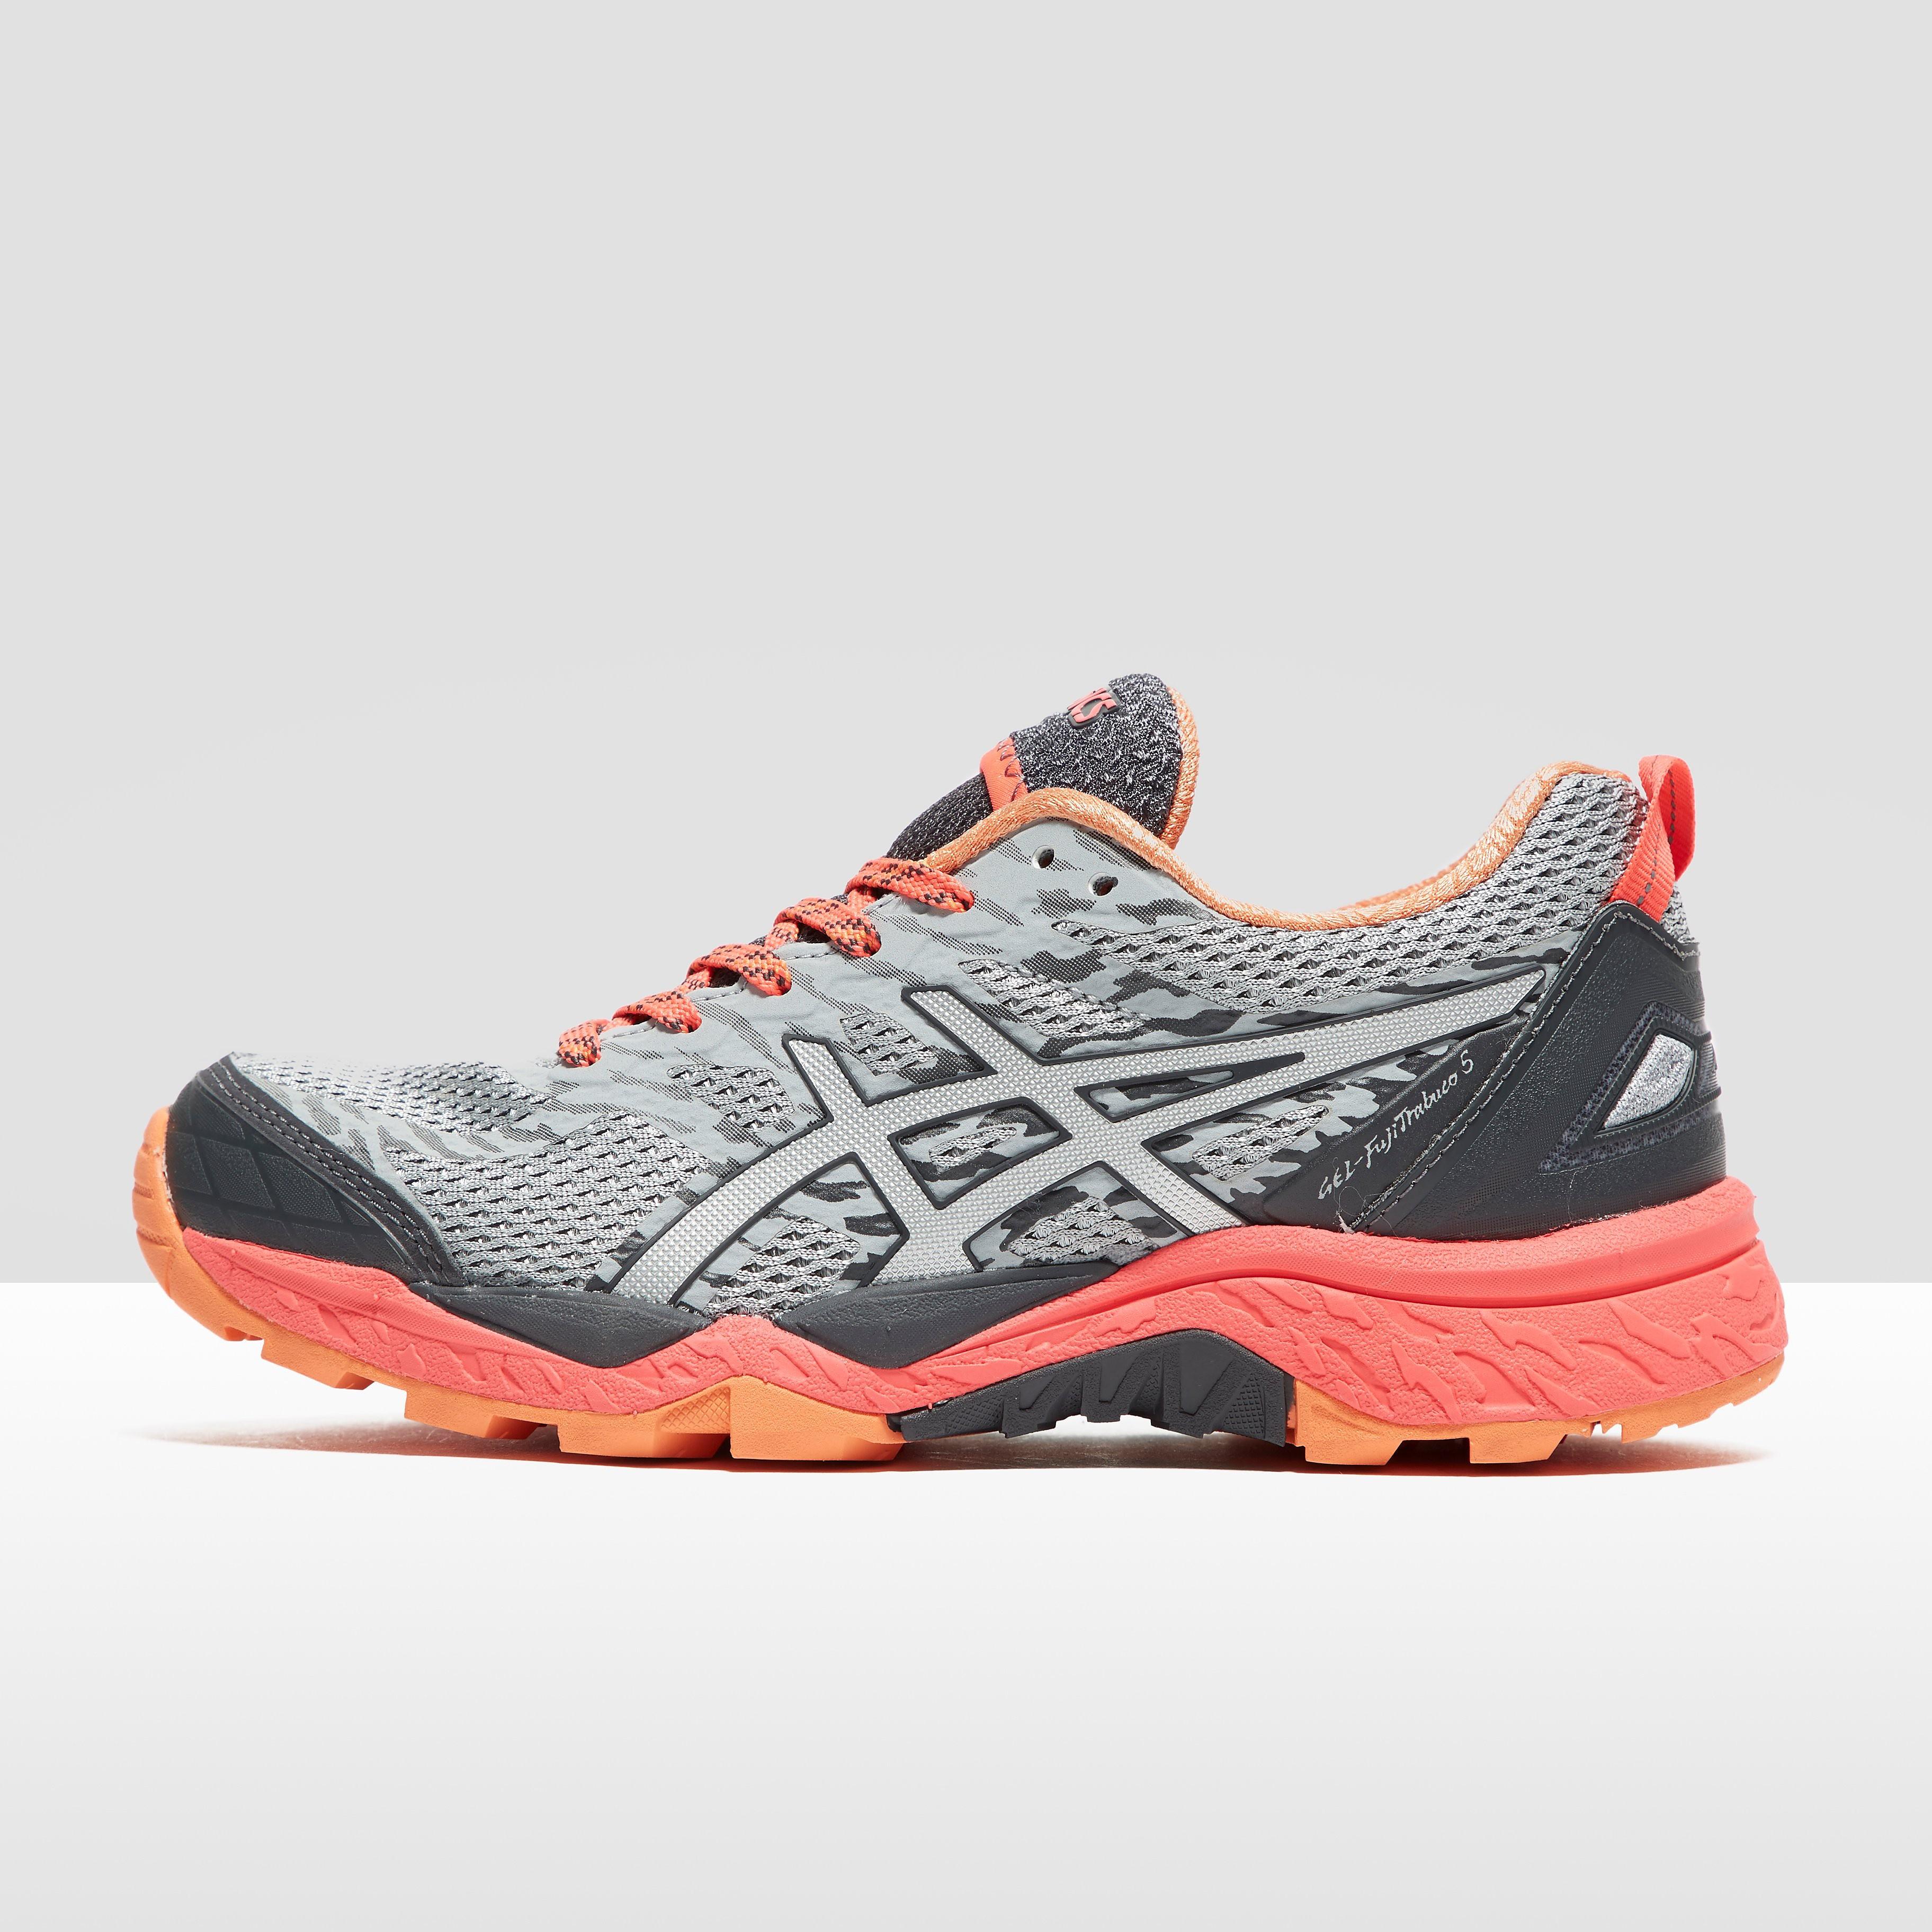 ASICS Gel-Fujitrabuco 5 Women's Trail Running Shoes